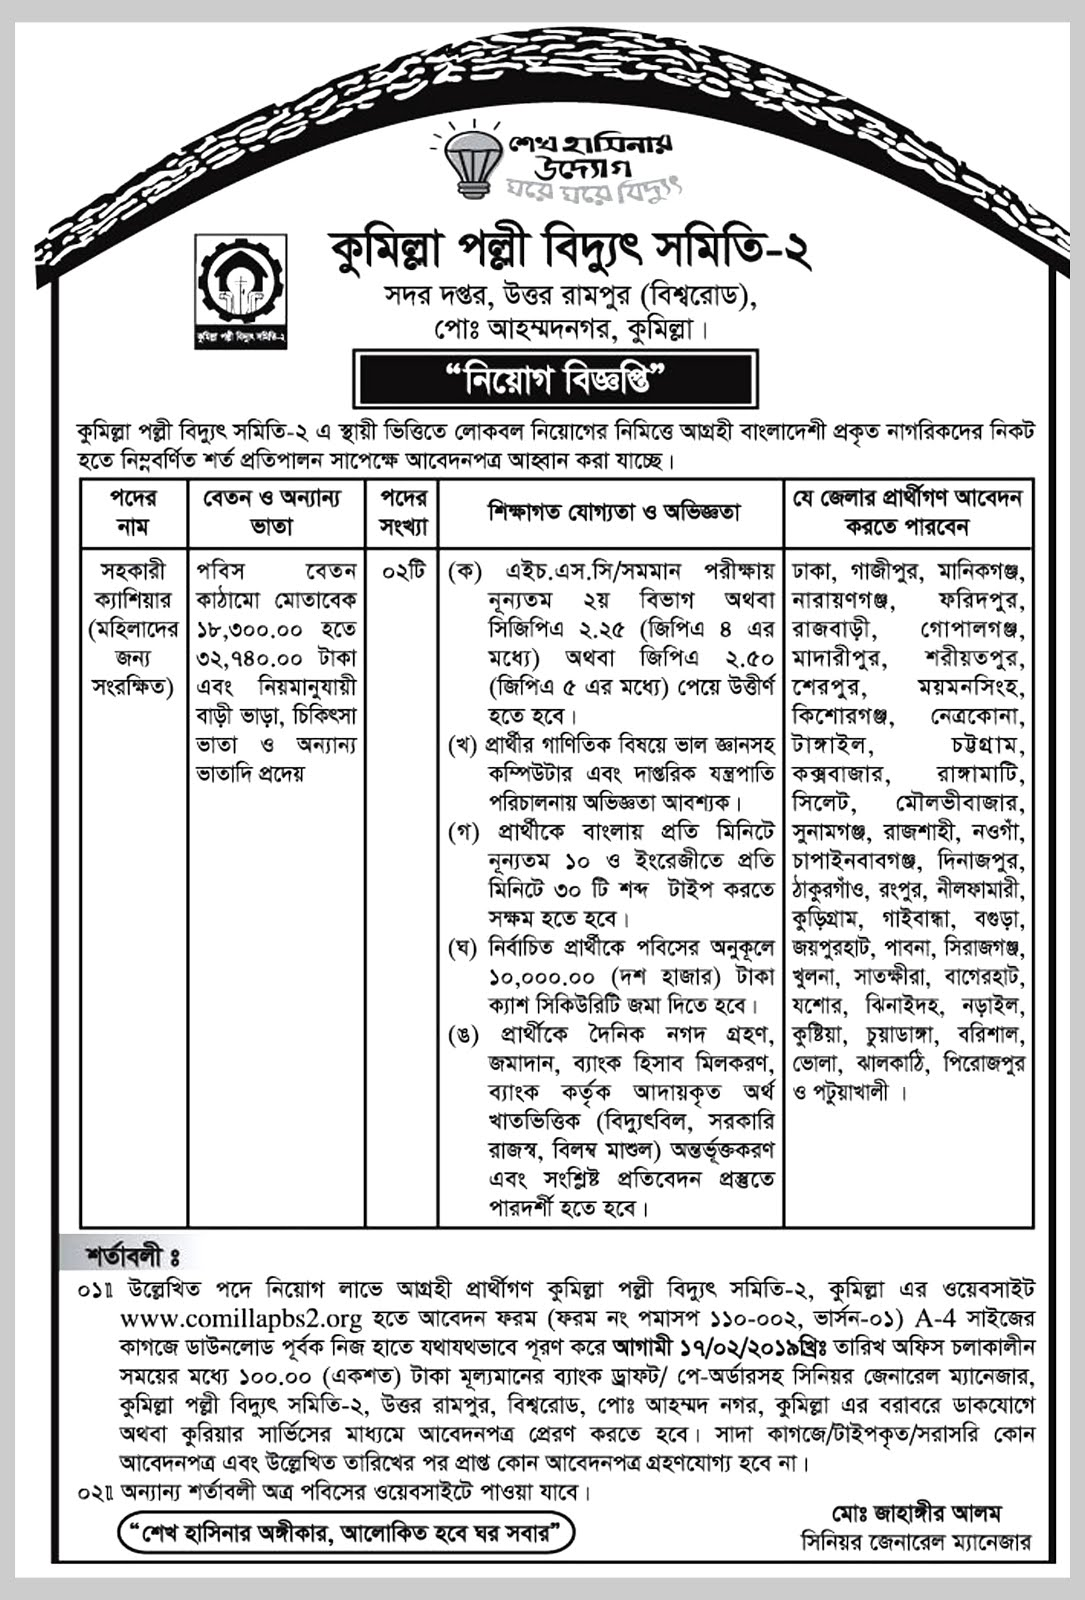 Palli-Bidyut-Samity-Job-Circular-2019%2Bcopy Job Application Form For Bd on blank generic, part time, free generic,